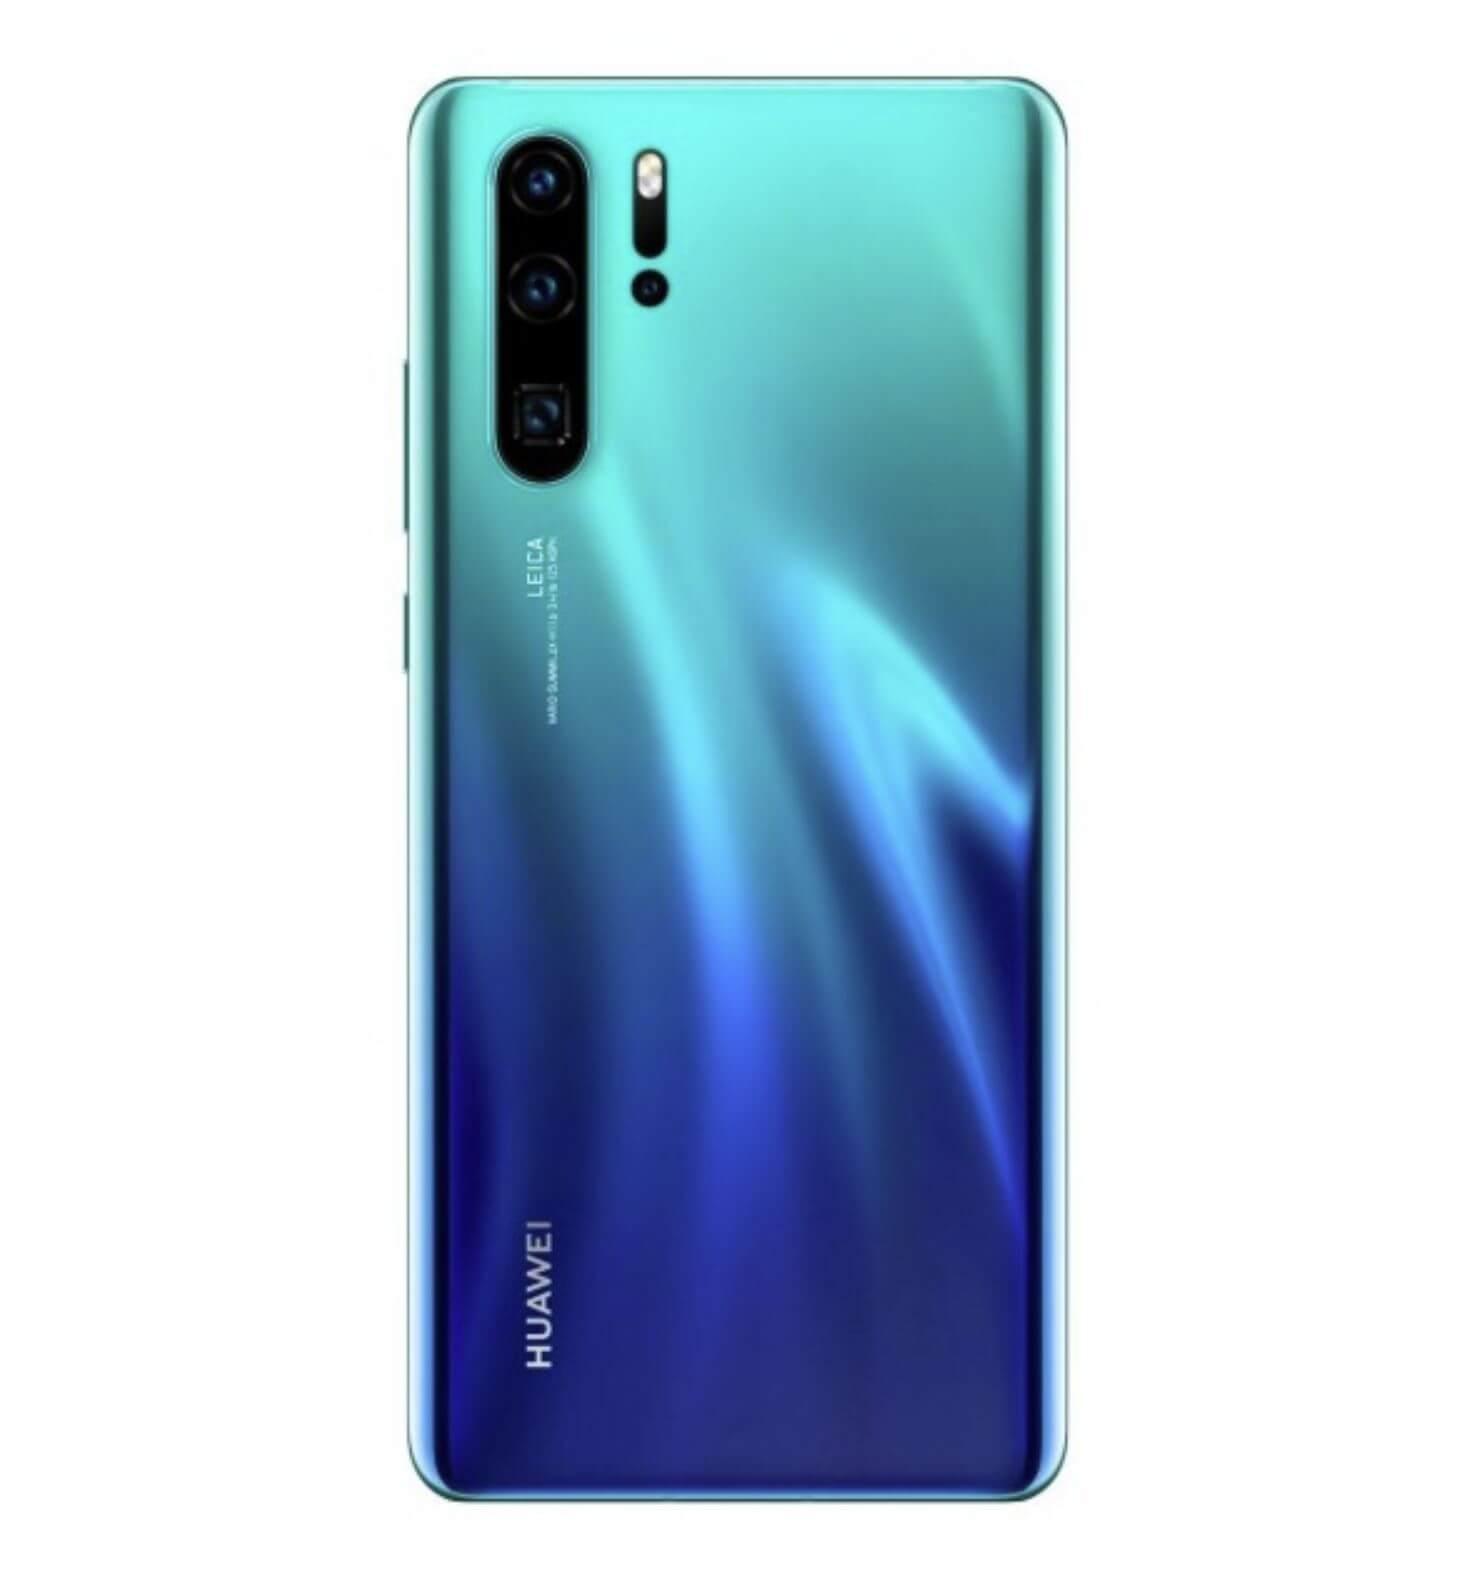 Huawei P30 Pro vs Xiaomi Black Shark 2 Karşılaştırması